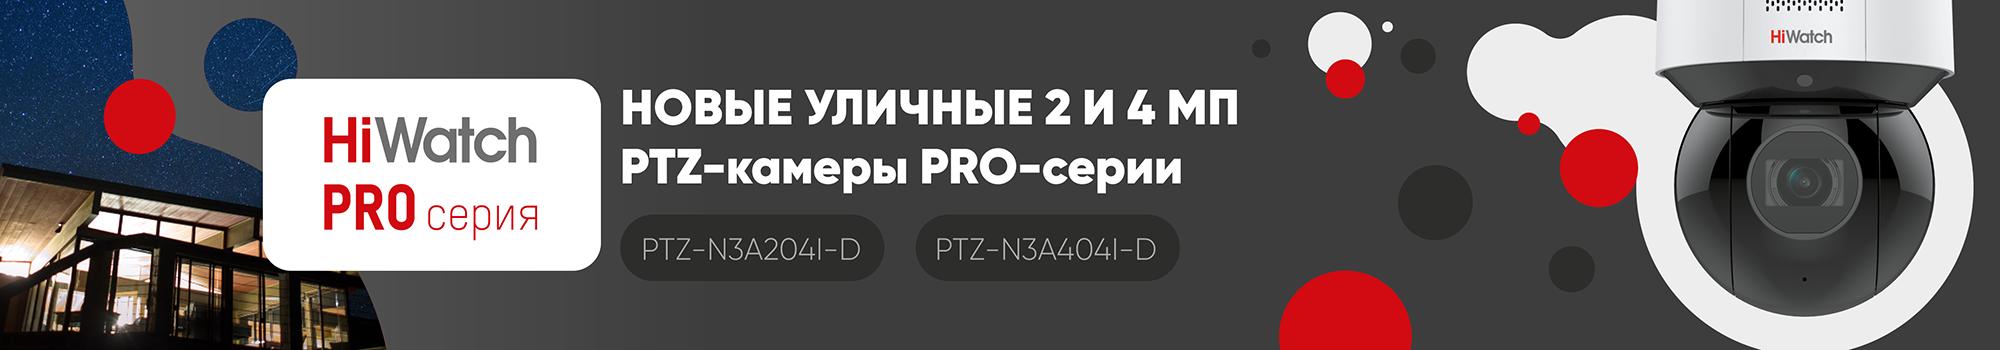 2000_ptz_hiwatch_pro_63